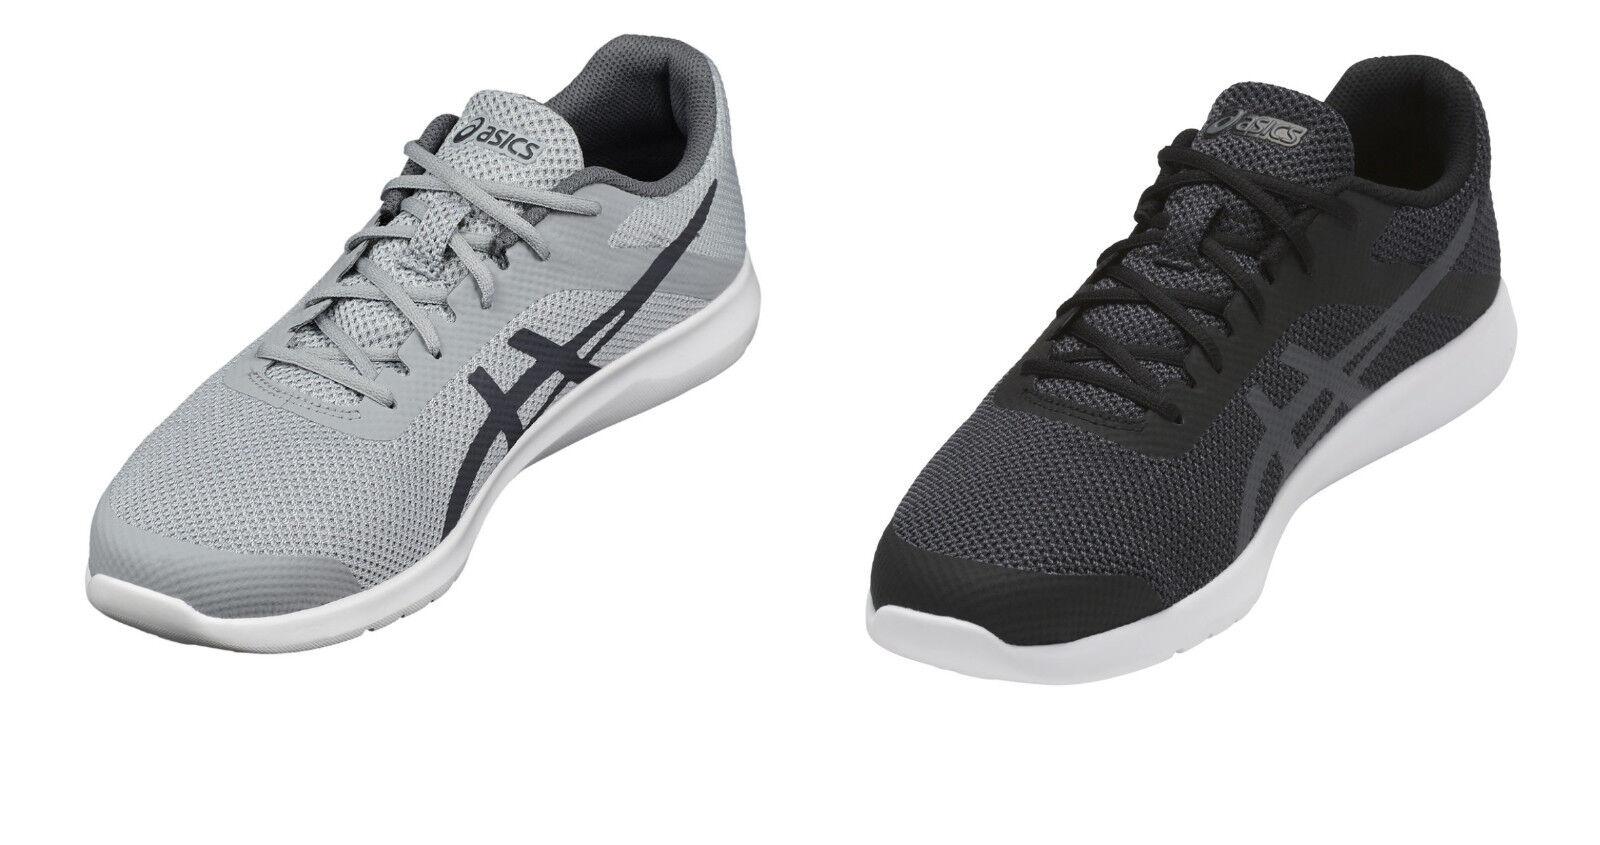 Details about Asics Fuzor 2 Men's Running Shoes Jogging Sport Shoes Trainers